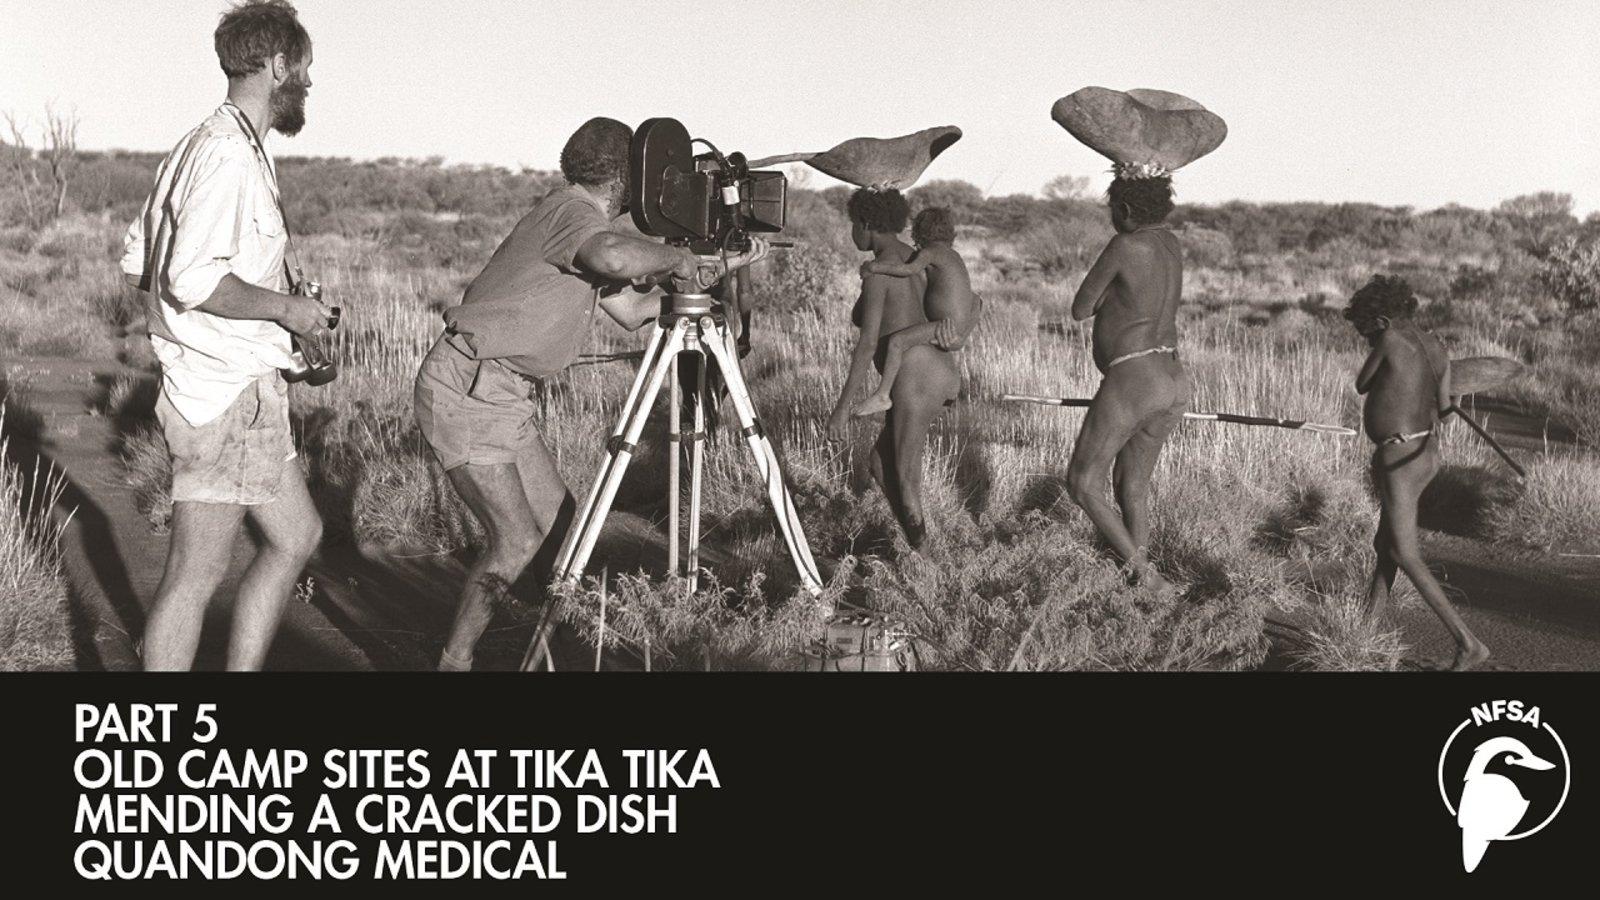 Old Camp Sites at Tika Tika - Mending a Cracked Dish